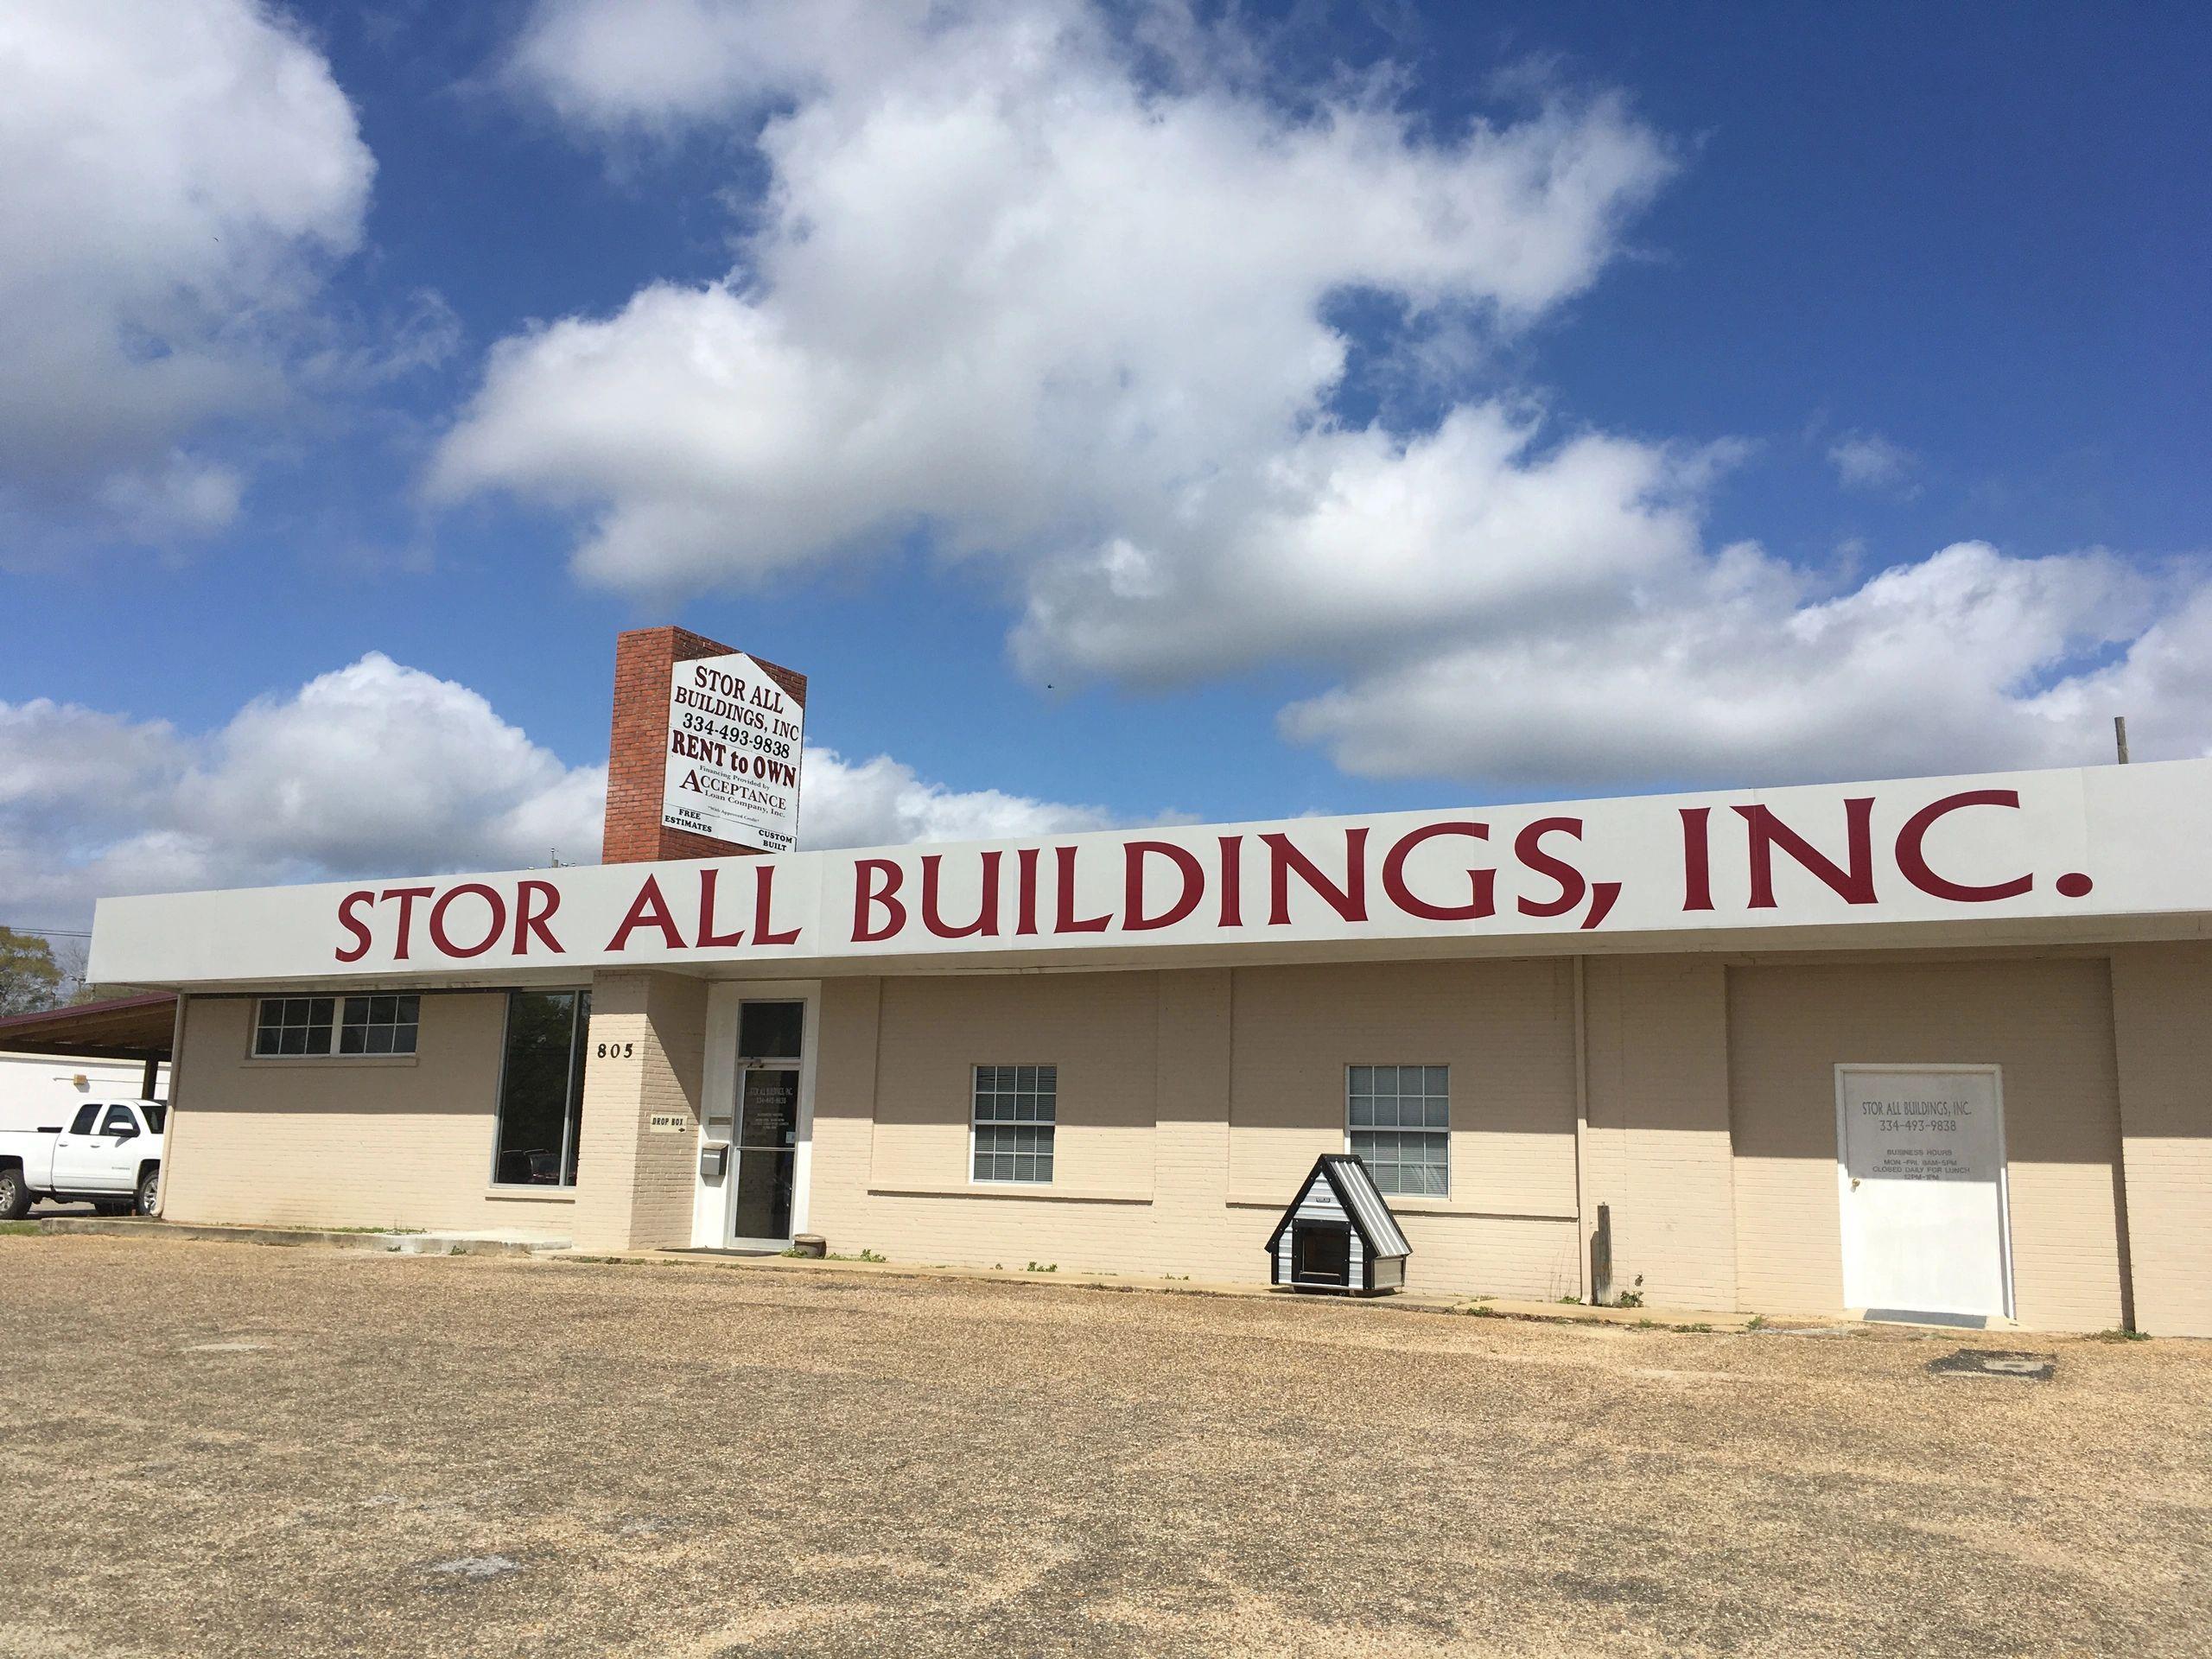 Stor All Buildings